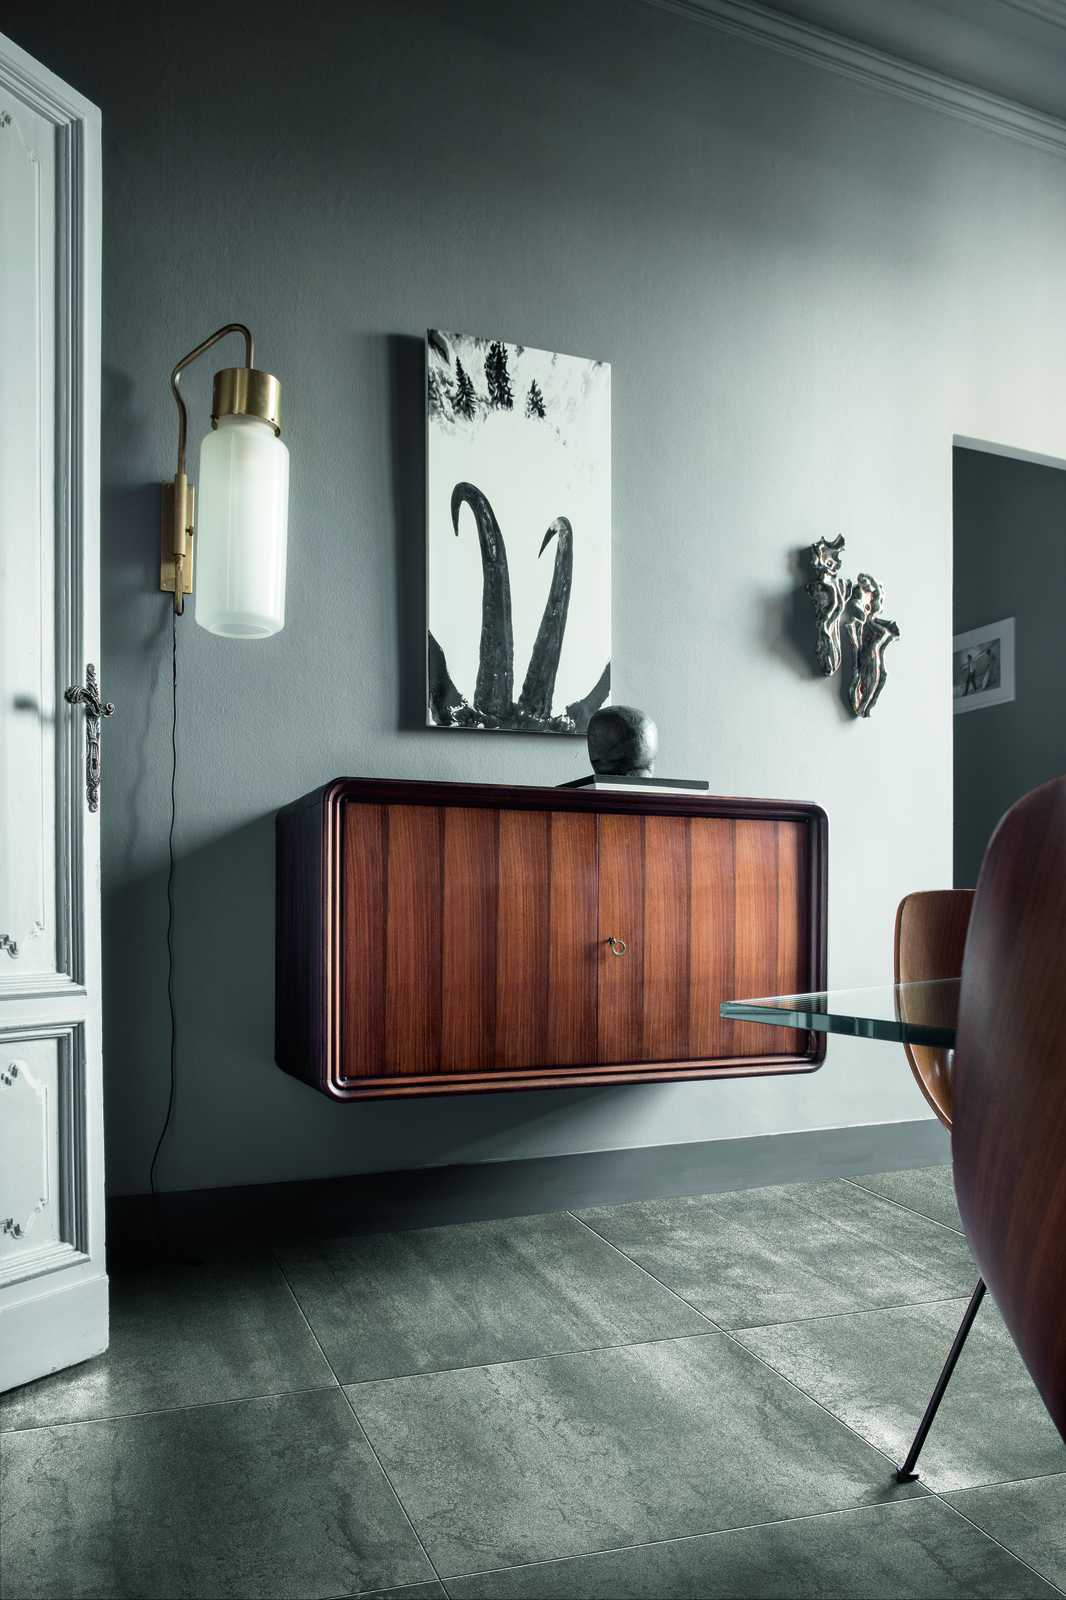 Fliesen In Der Farbe Grau: Unsere Kollektionen   Marazzi 8663